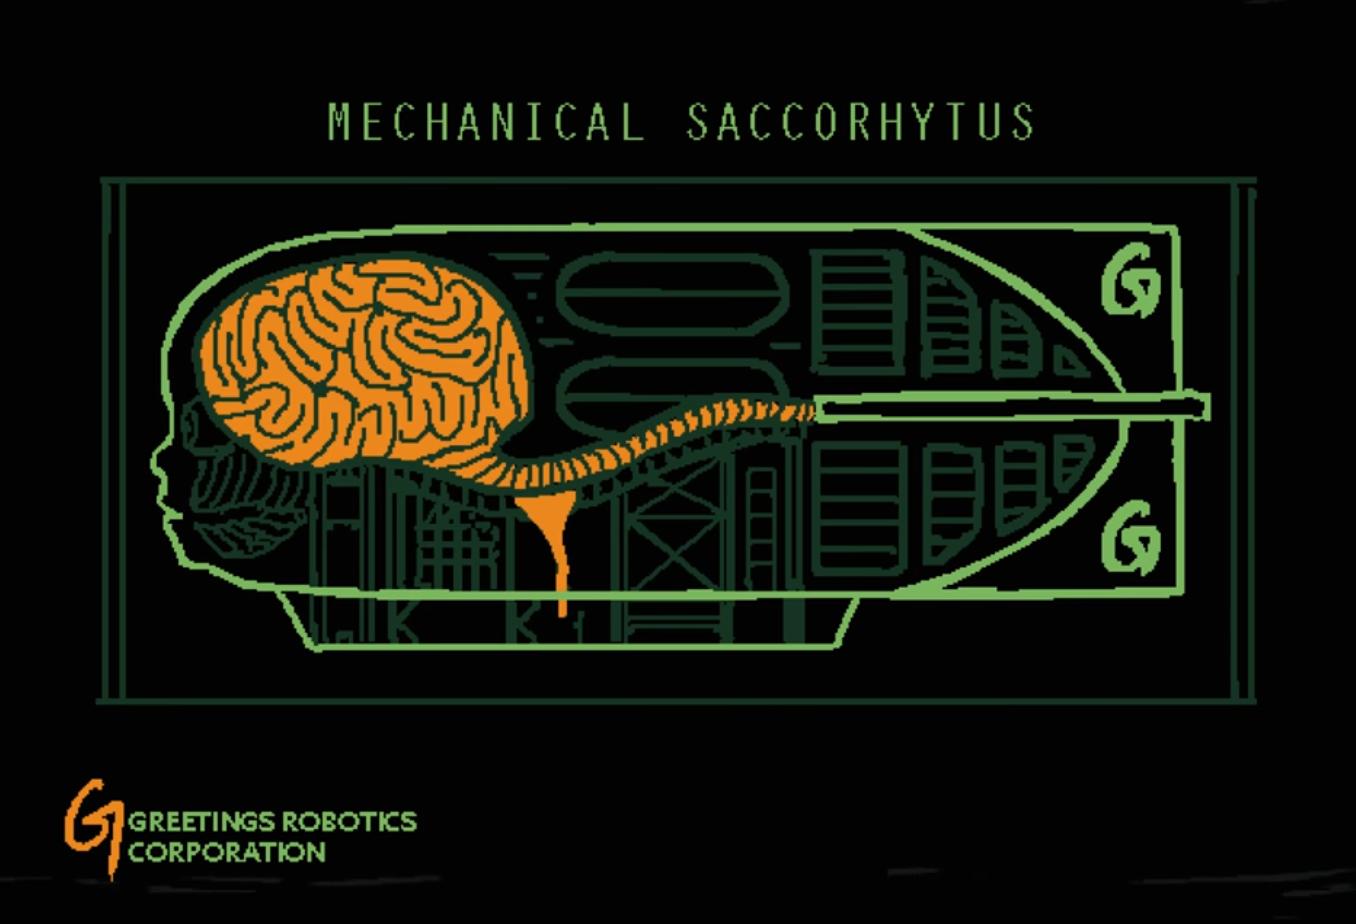 Mechanical saccorhytus